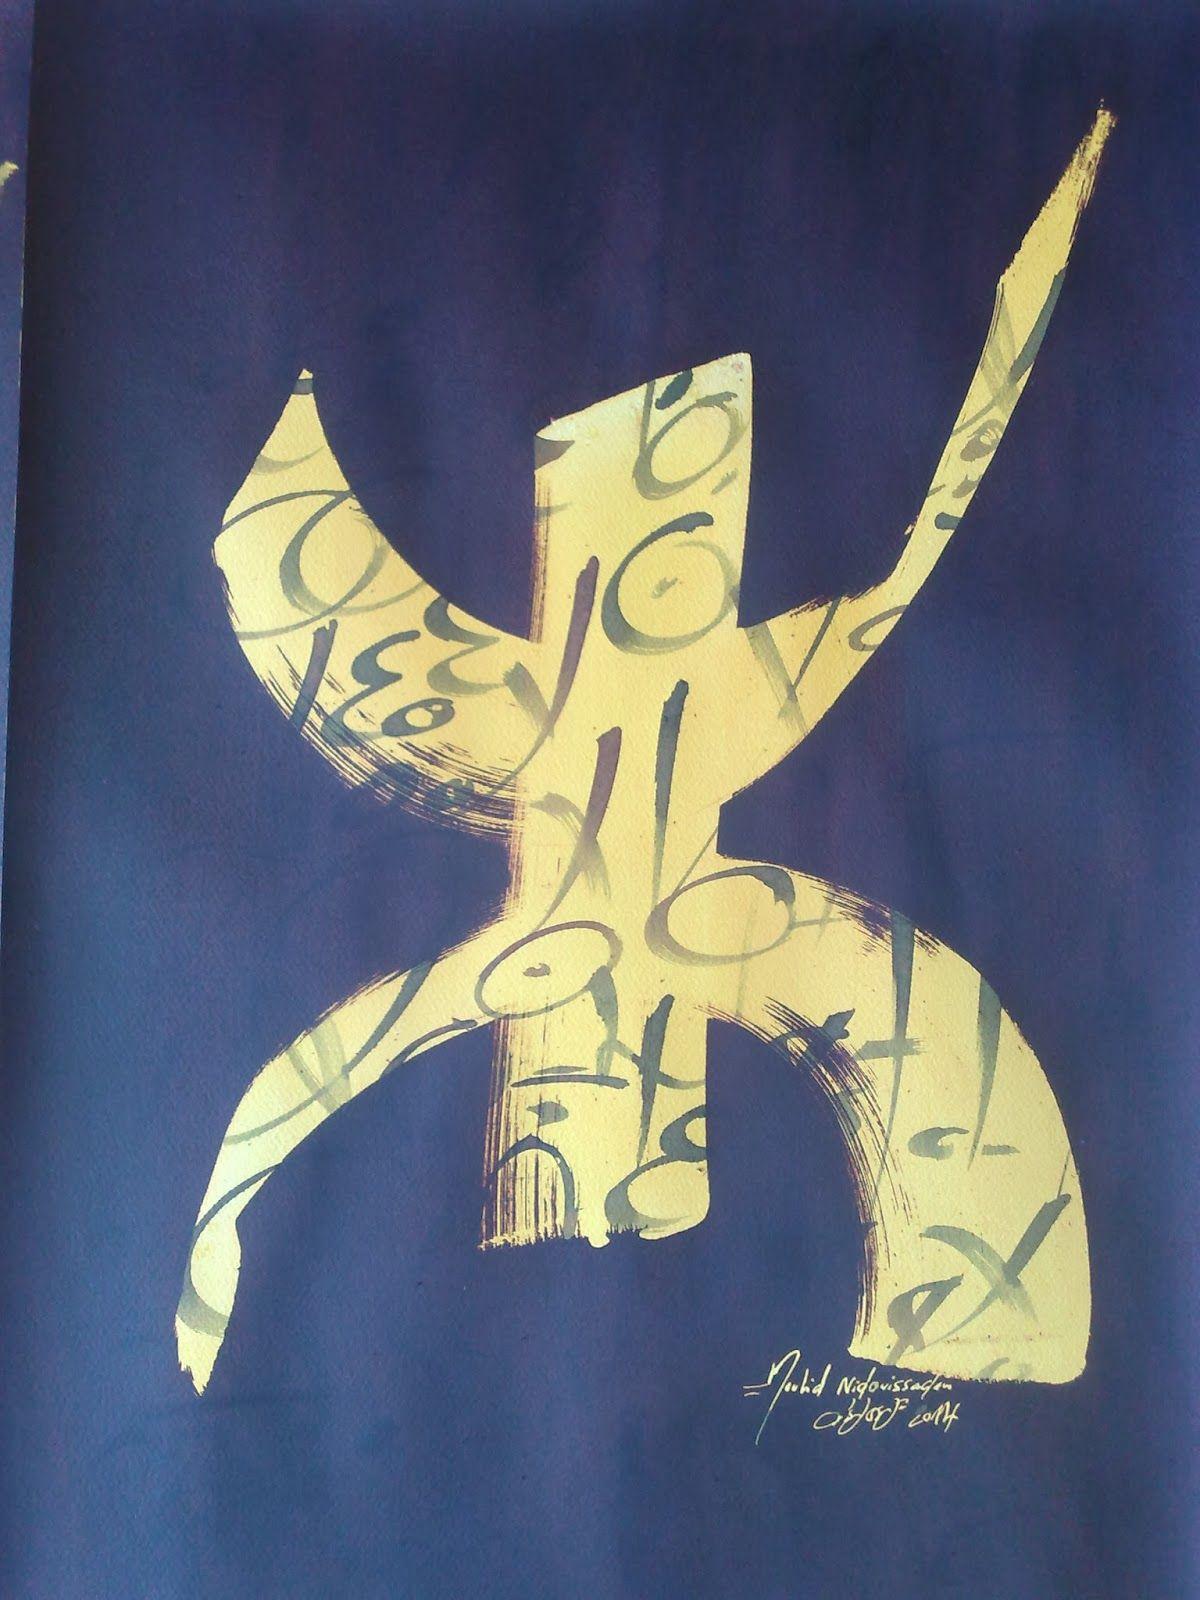 symbole de la libert chez les amazighs les hommes libres du nord de l 39 afrique endroits. Black Bedroom Furniture Sets. Home Design Ideas